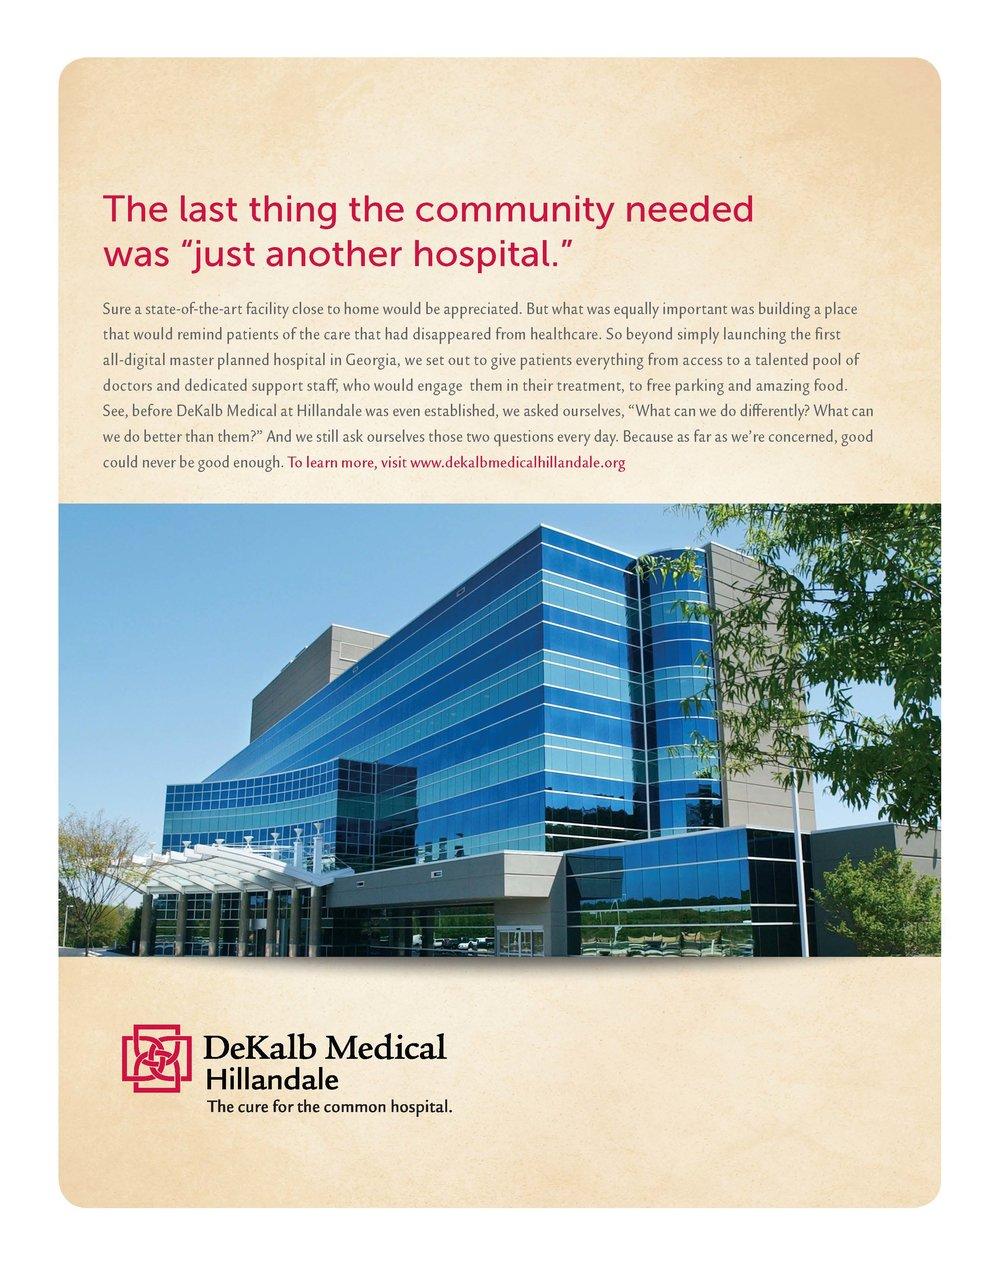 DeKalb-Medical_Hillandale_2 Print Ads_Page_2.jpg